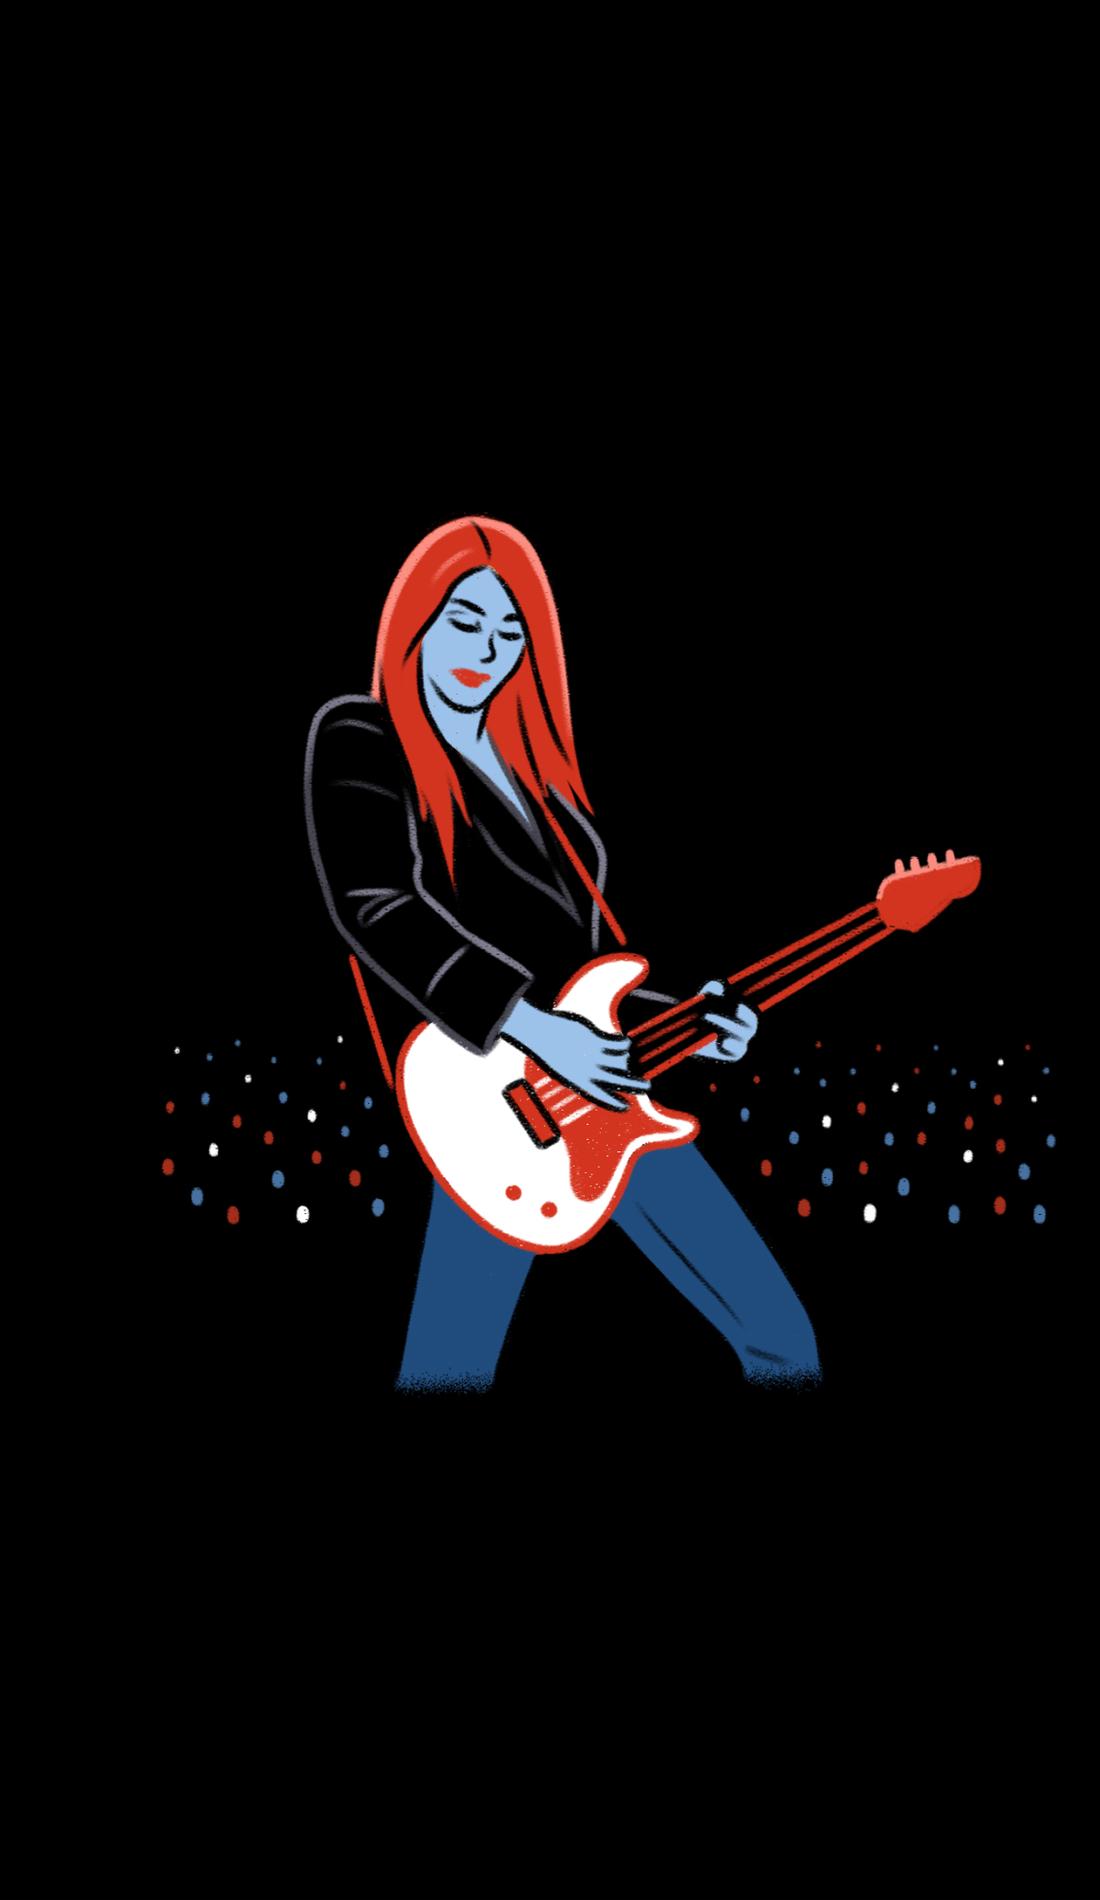 A Mix Live live event